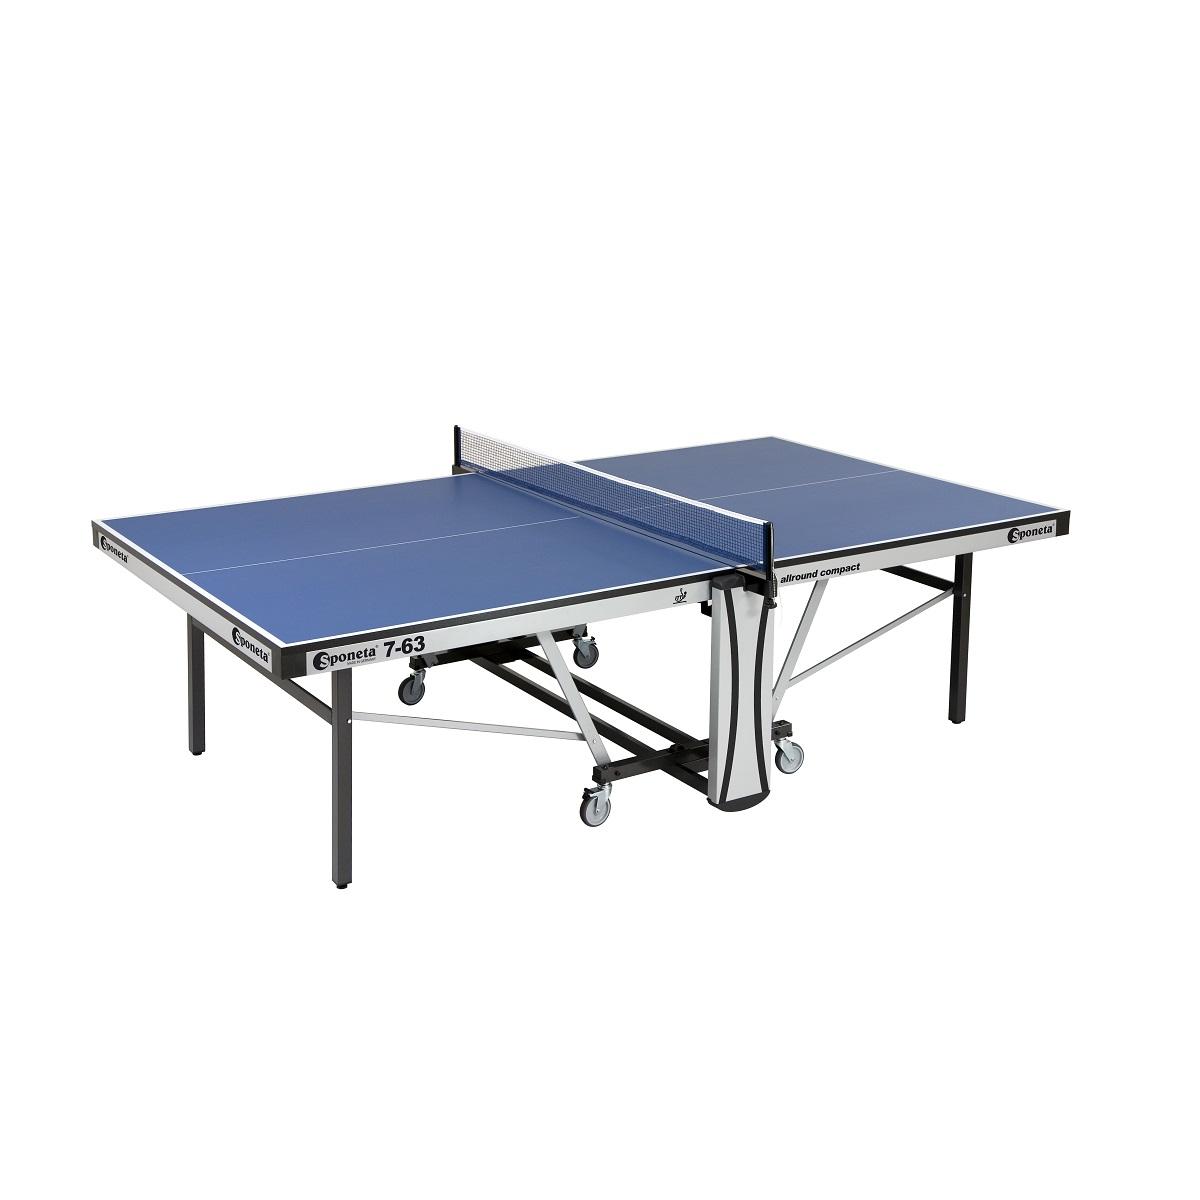 Stůl na stolní tenis SPONETA S7-63i - modrý